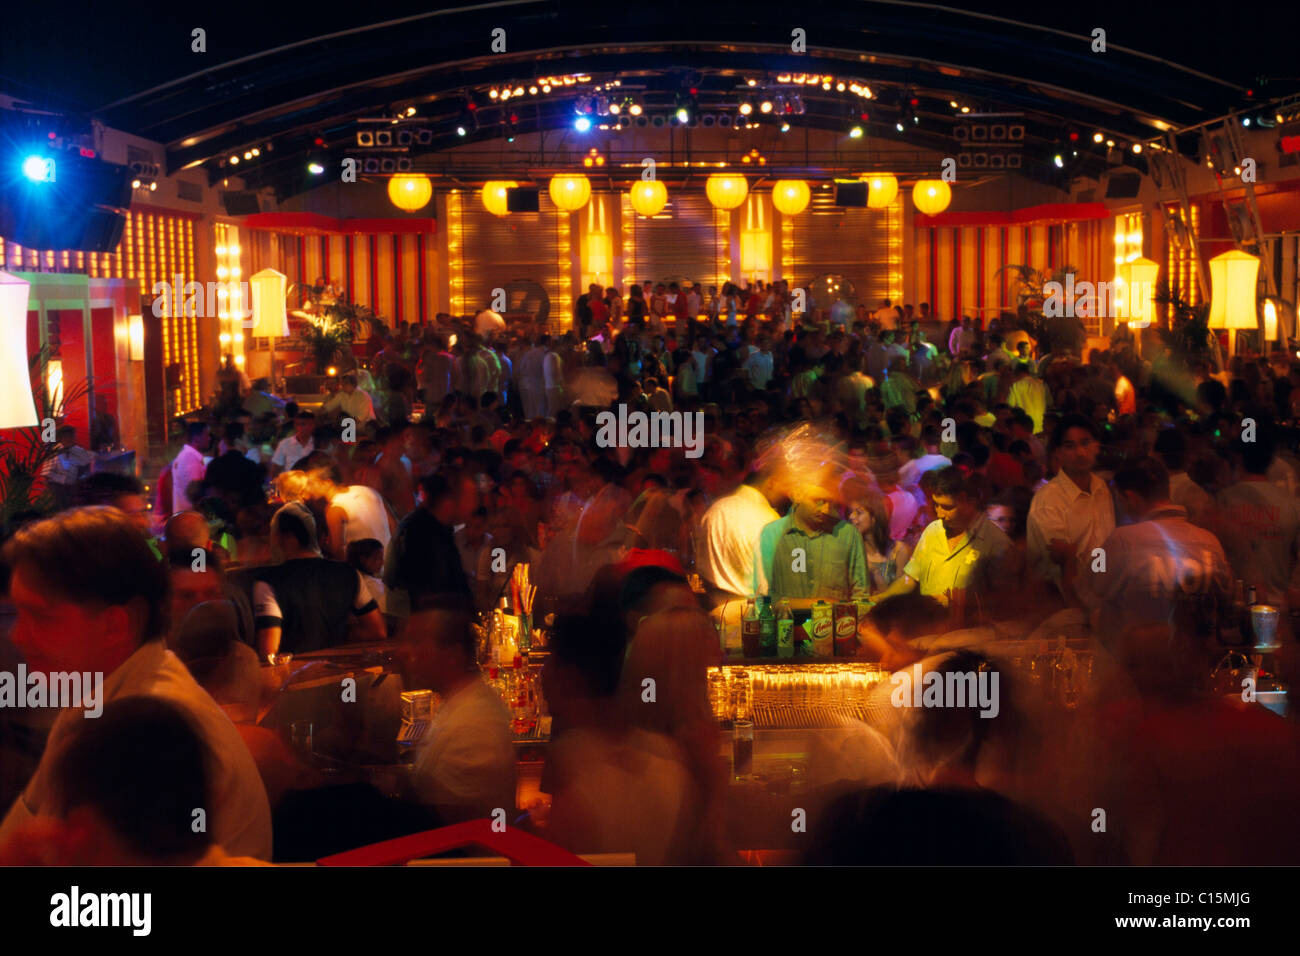 Gallery images and information kos greece nightlife -  Club Privilege Nightclub Kallithea Kassandra Chalkidiki Greece